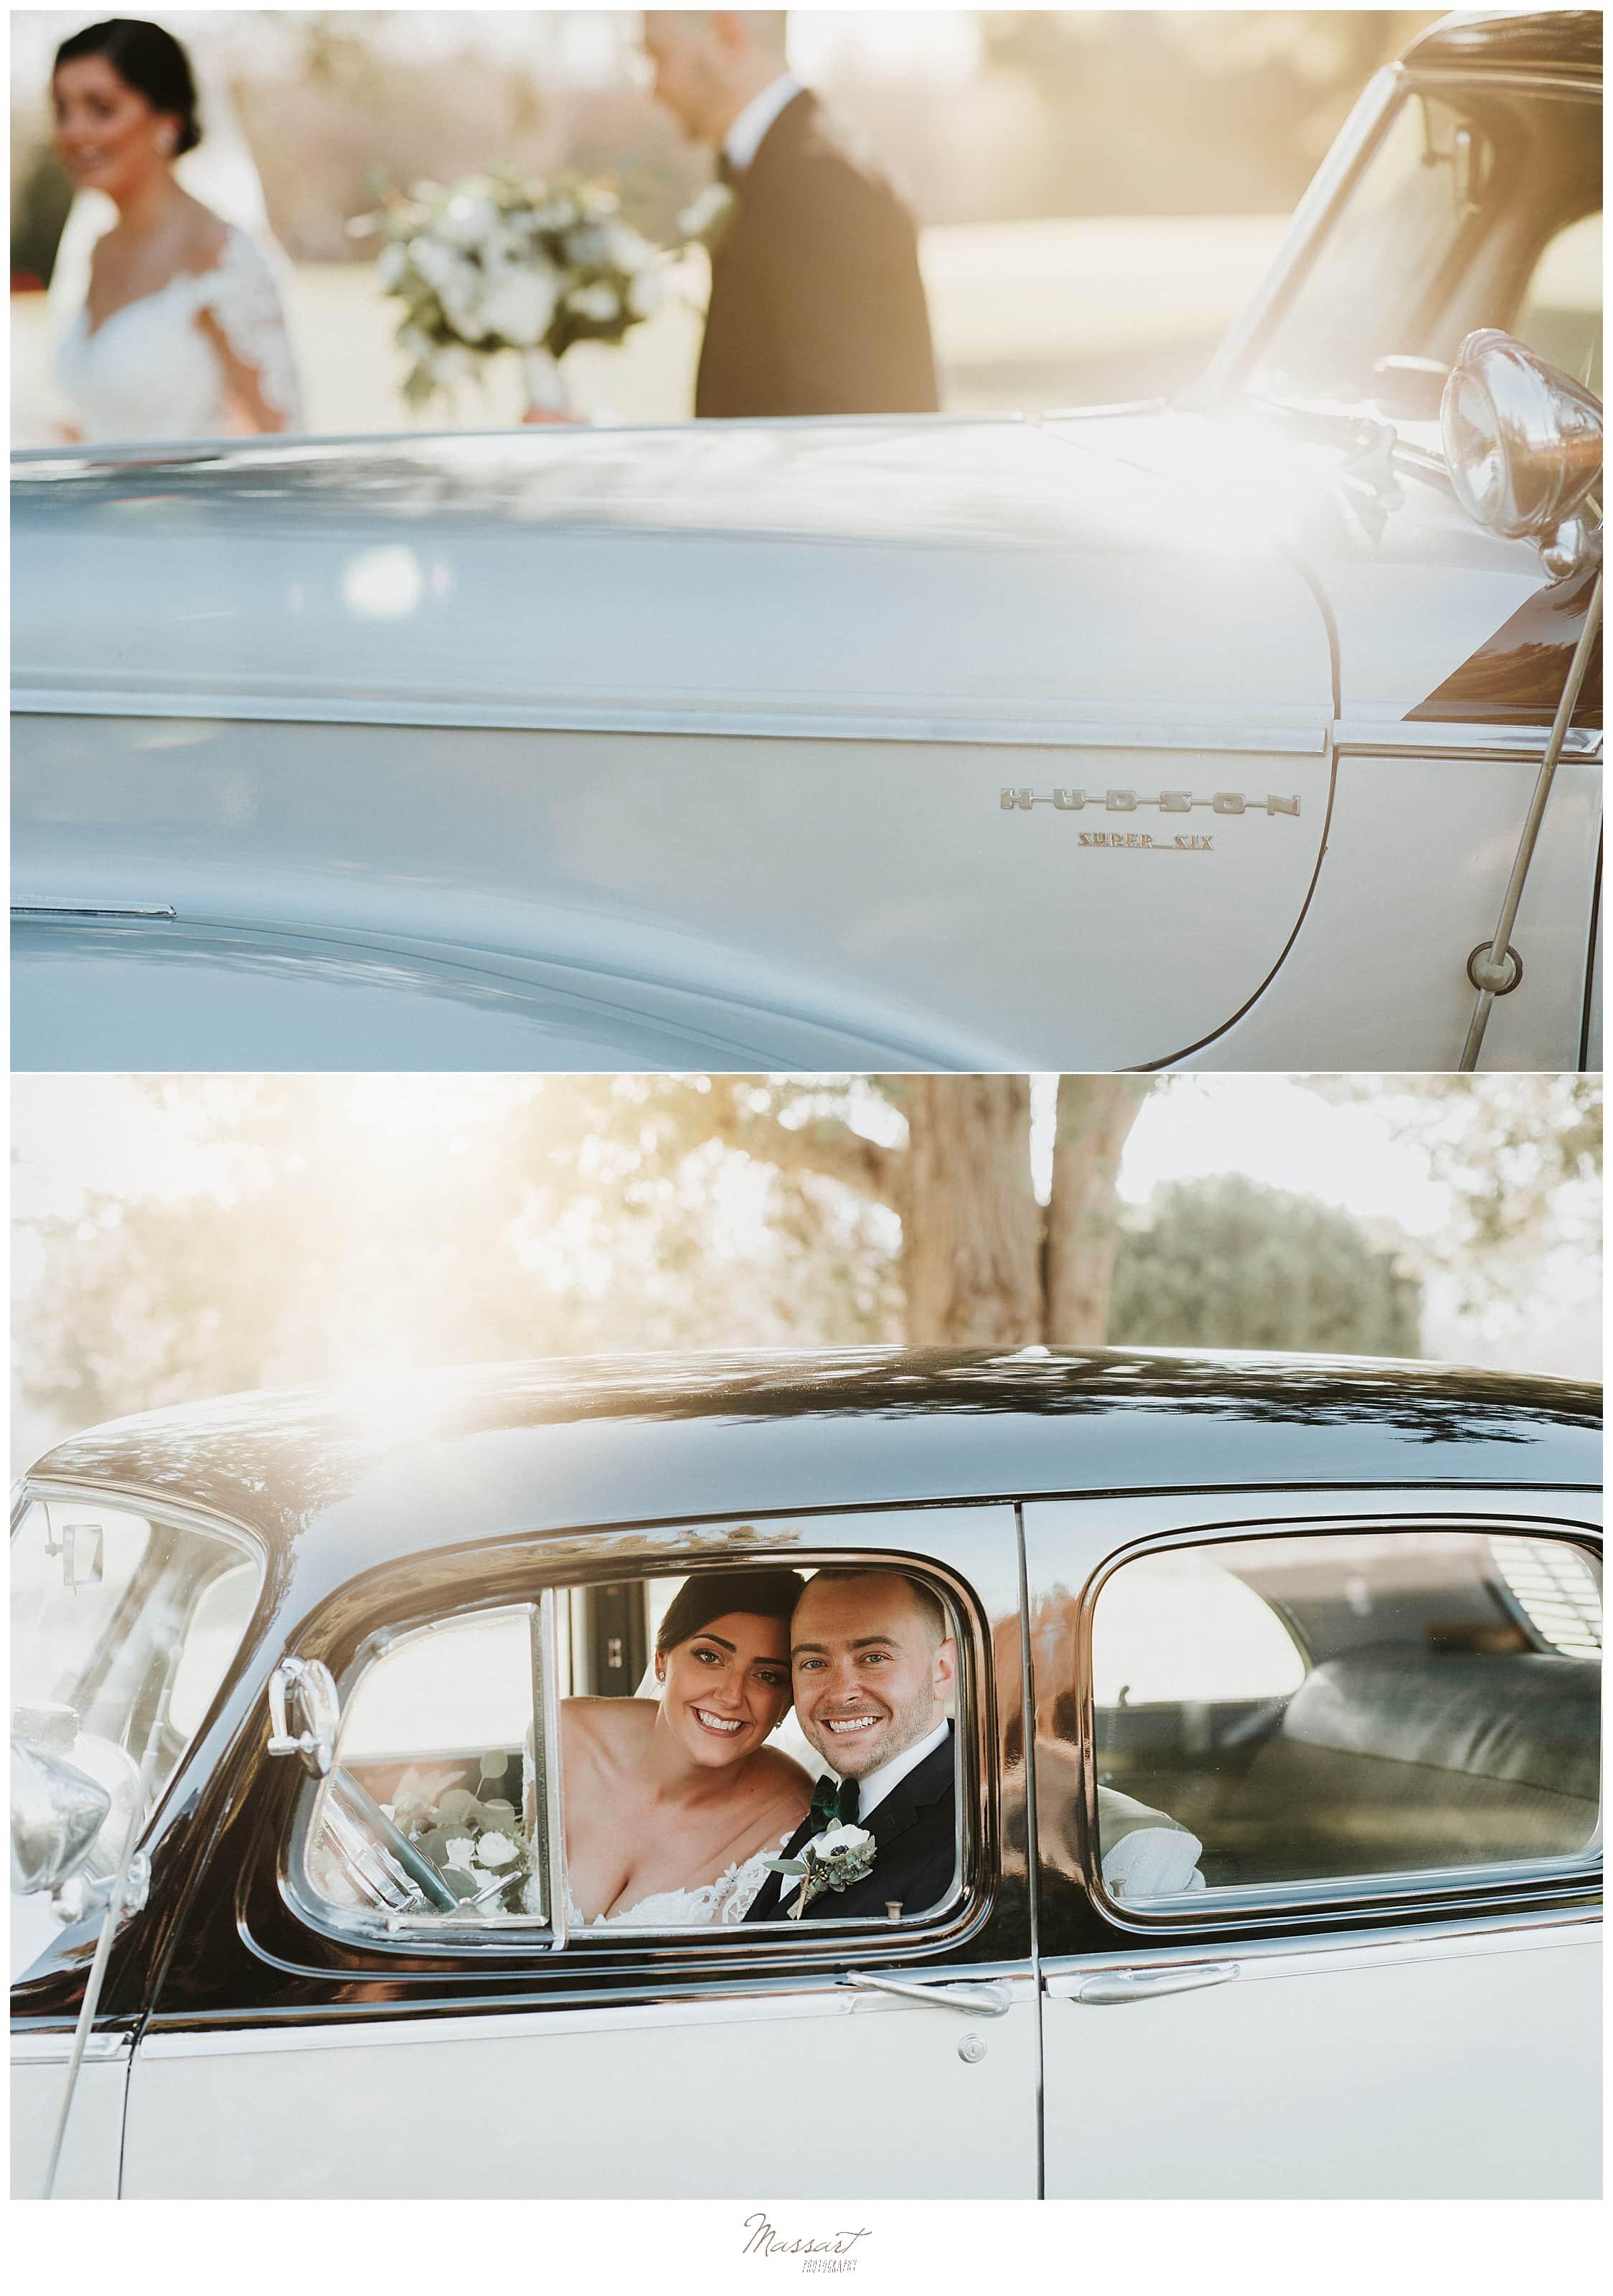 classic car wedding portraits by Massart Photography